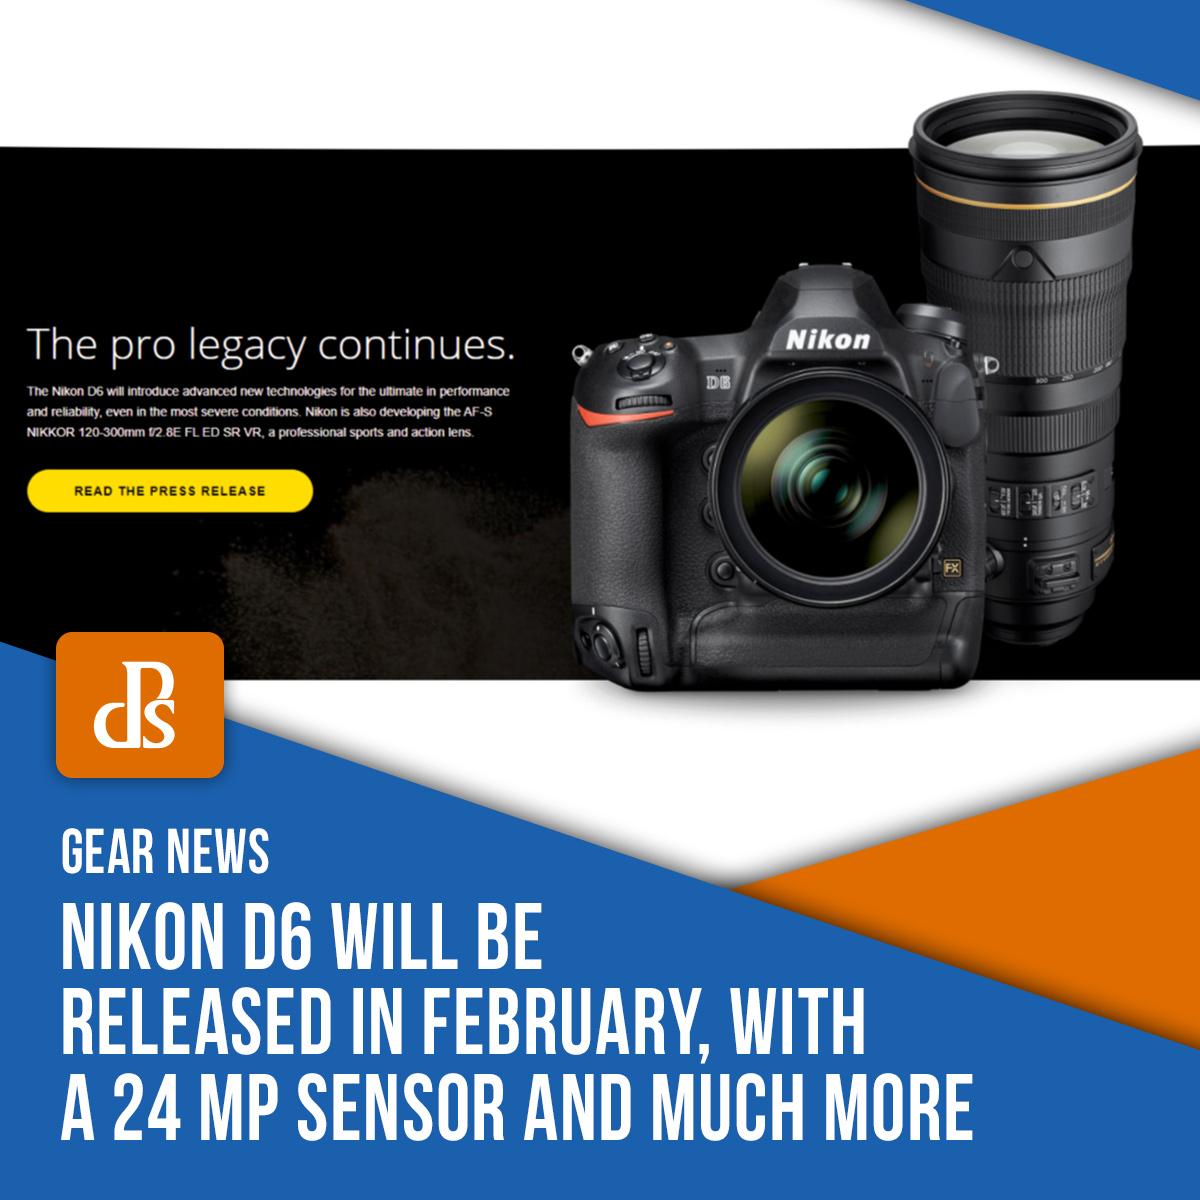 news-nikon-d6-release-date